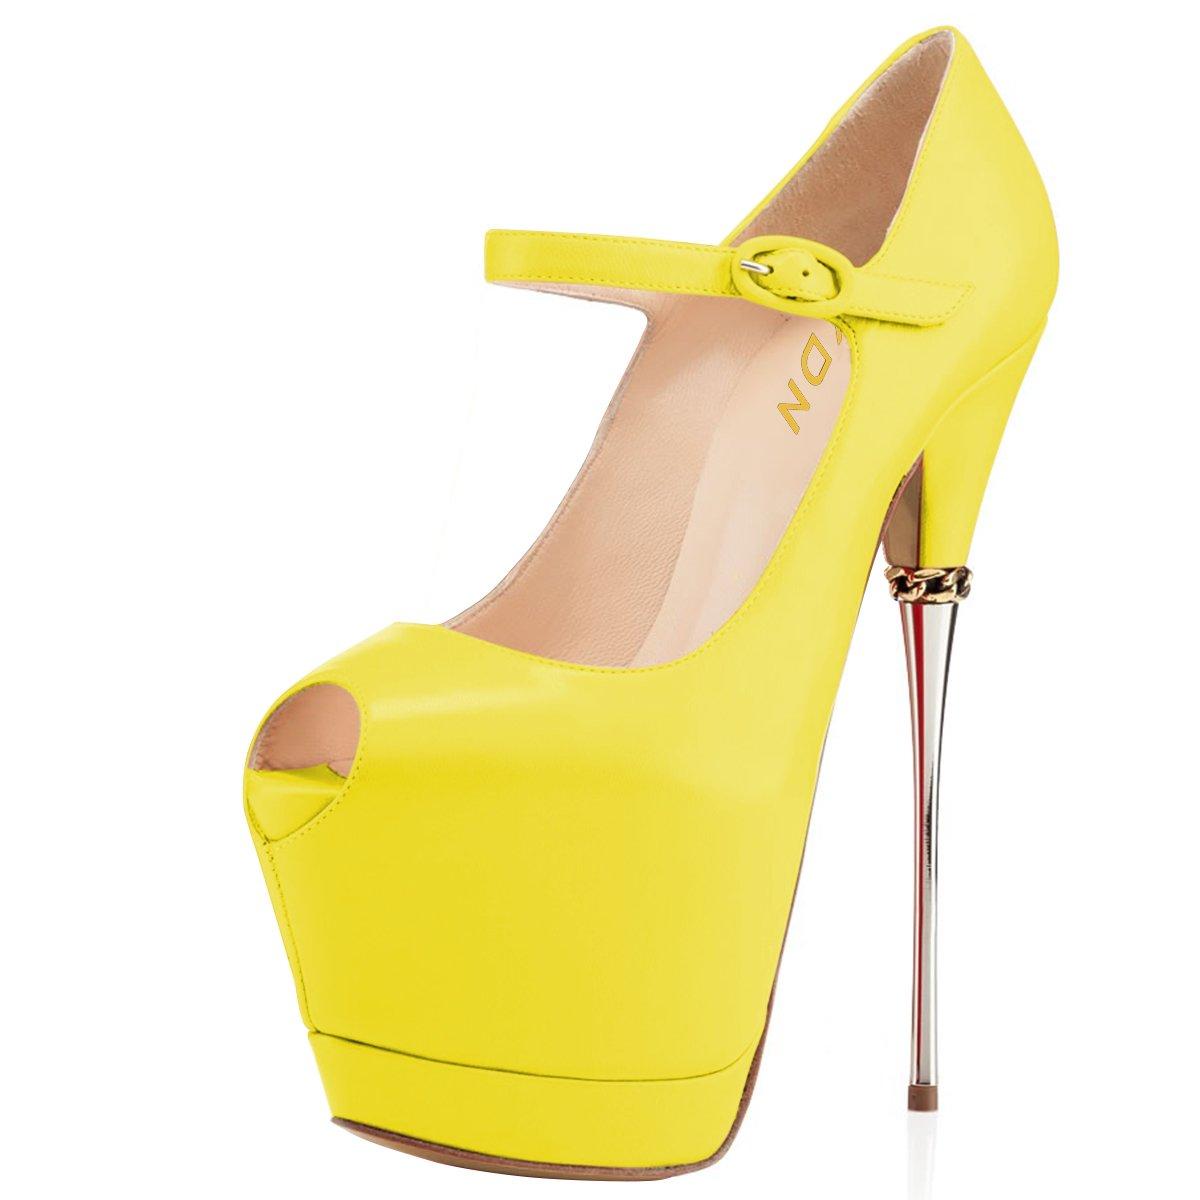 YDN Women Peep Toe Sky High Heels Platform Pumps Ankle Straps Shoes Metal Stilettos B07F1N35X4 14 M US|Yellow-pu